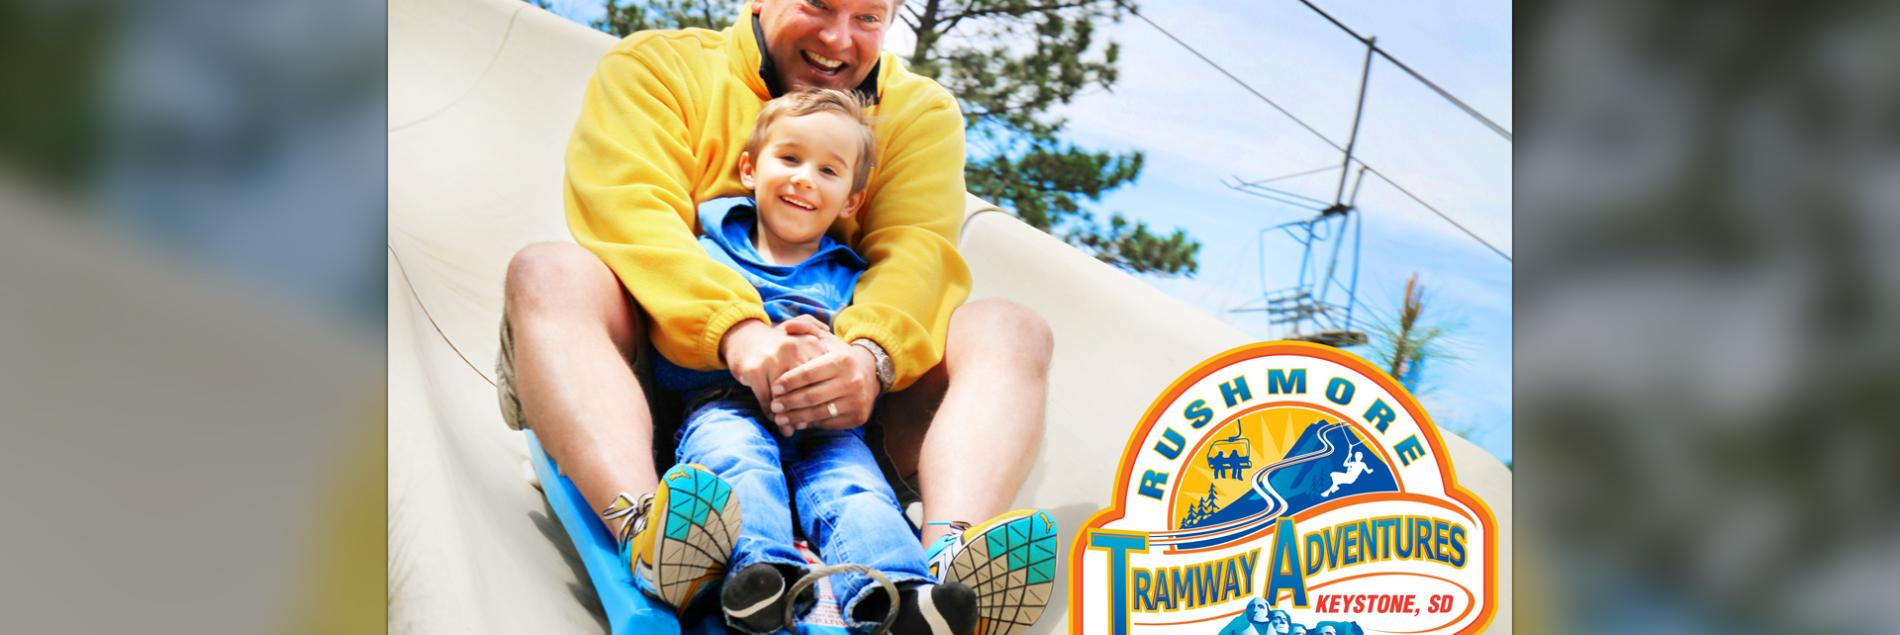 Zipline at Rushmore Tramway Adventures*